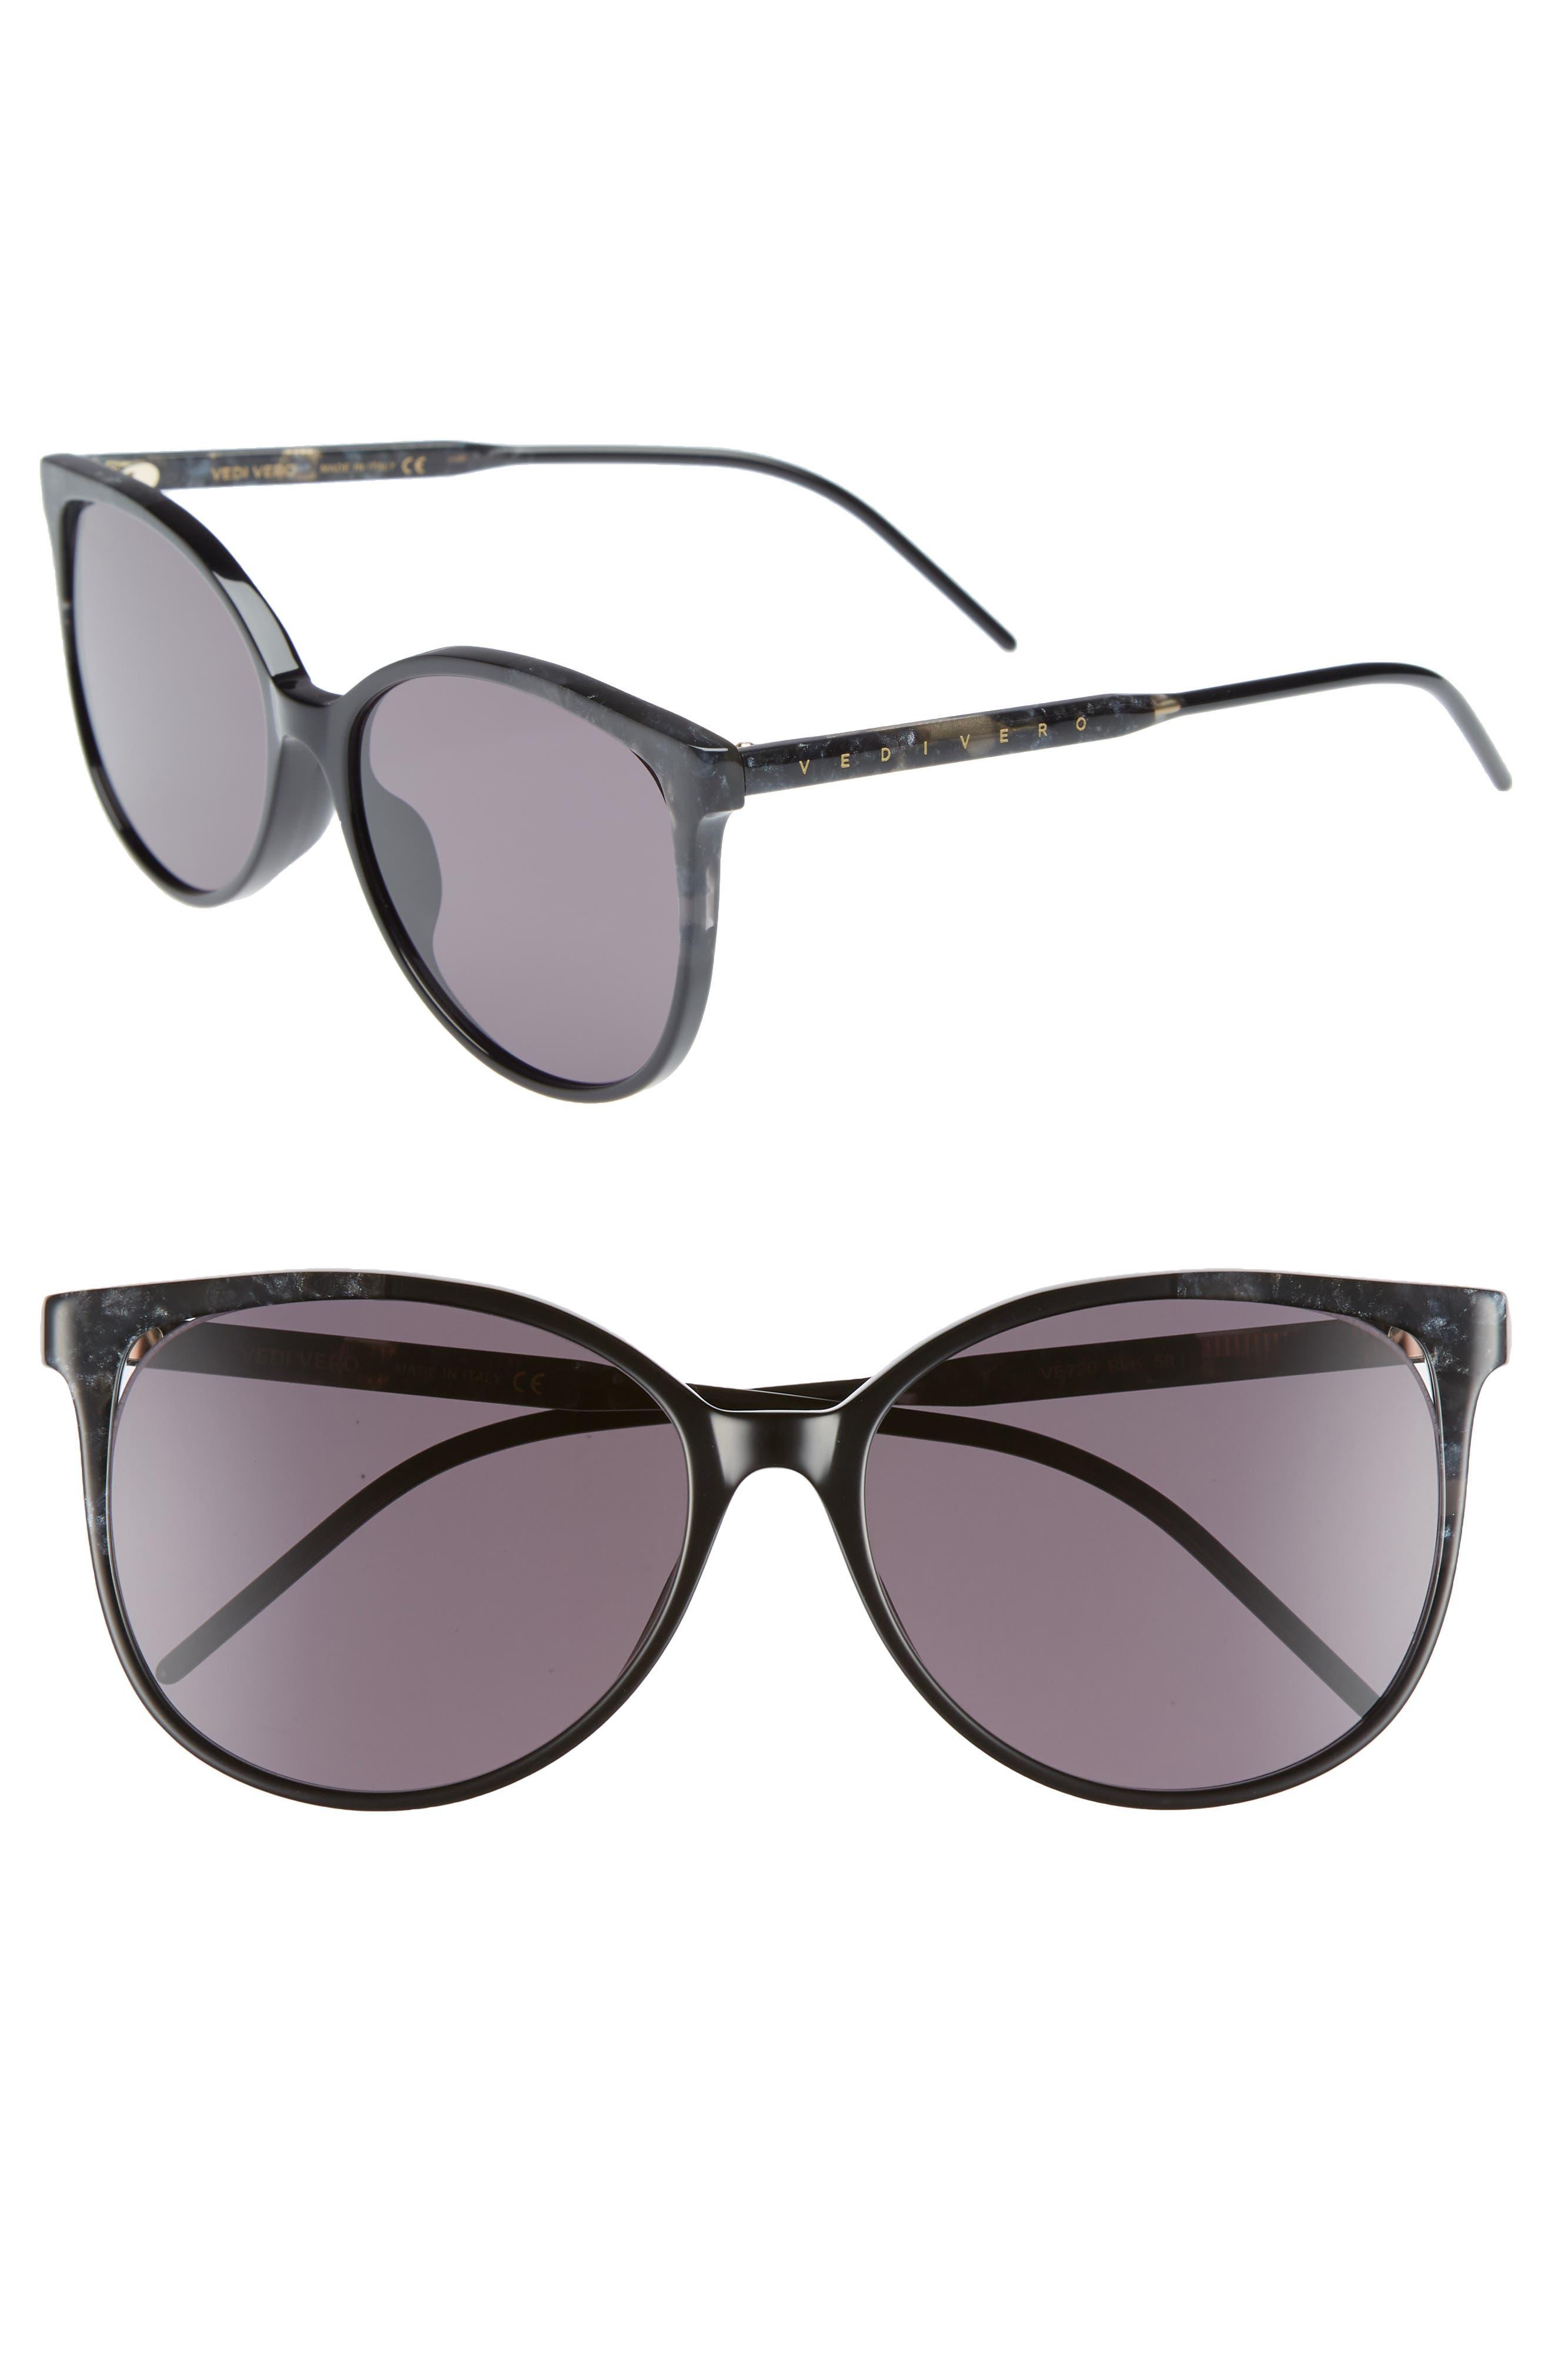 59mm Round Sunglasses,                         Main,                         color, BLACK/BROWN